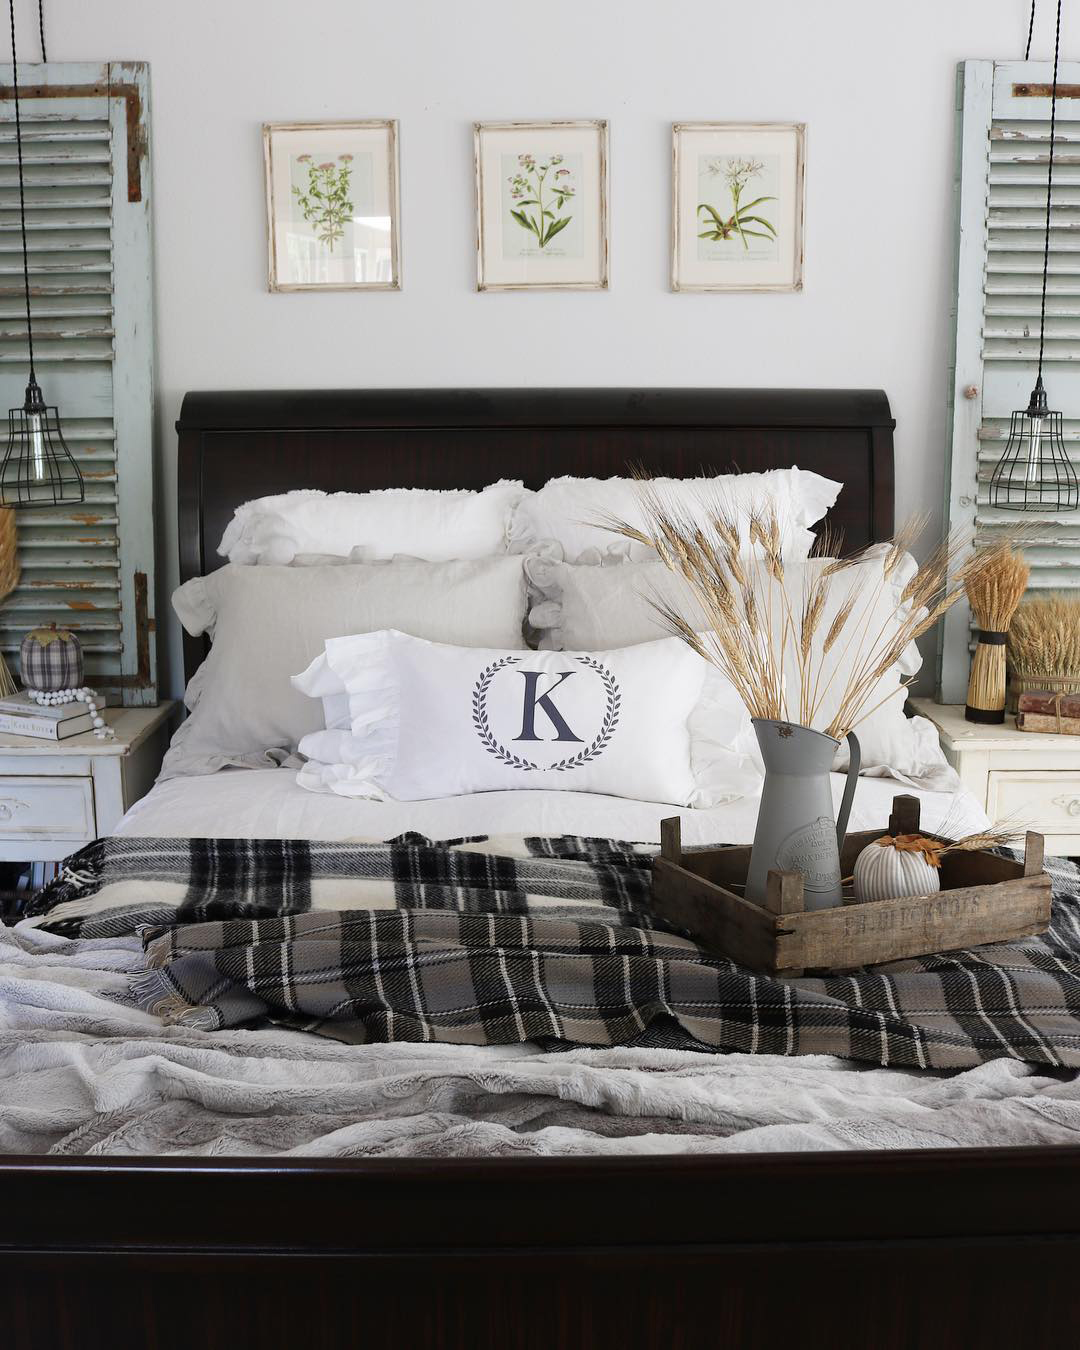 Beautiful Fall Bedroom | The Design Twins